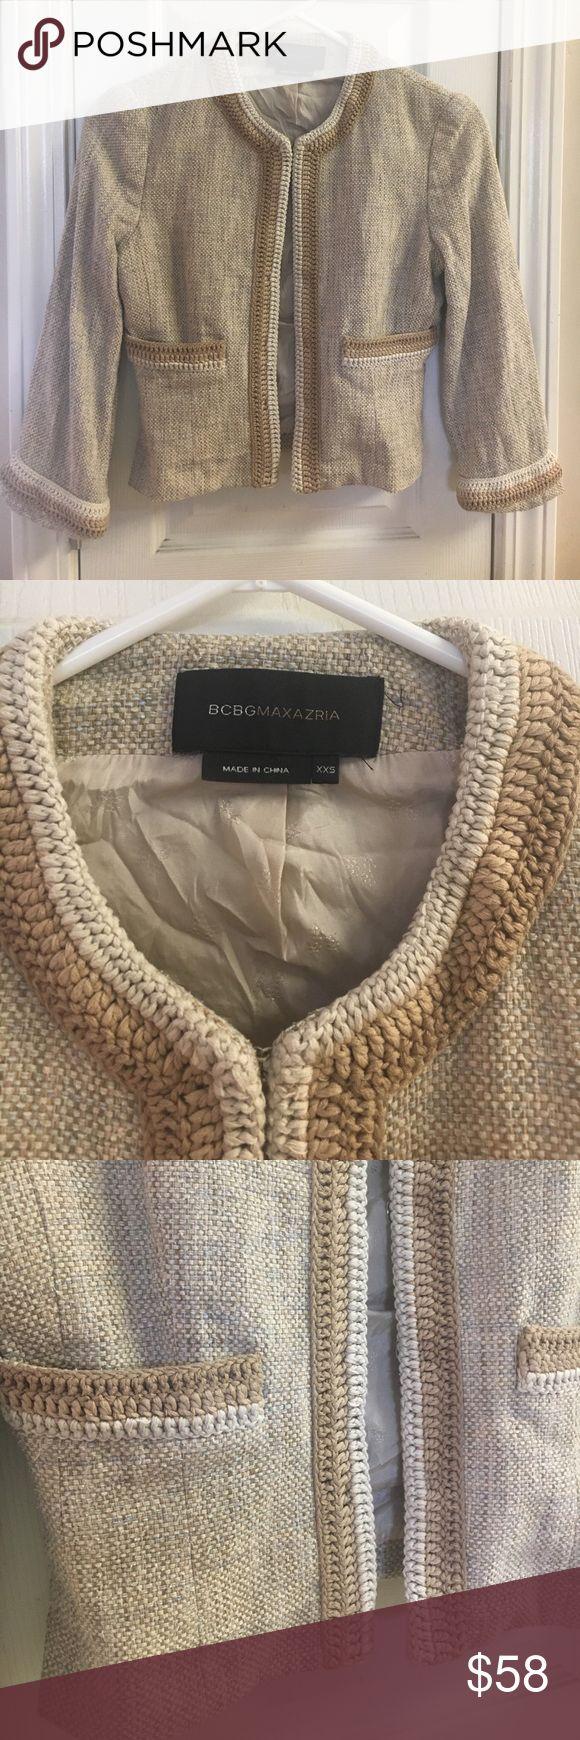 BCBGMAXAZRIA 100% silk lined jacket BCBGMAXAZRIA Jacket, Womens size XXS 100% silk lined tan jacket BCBGMaxAzria Jackets & Coats Blazers